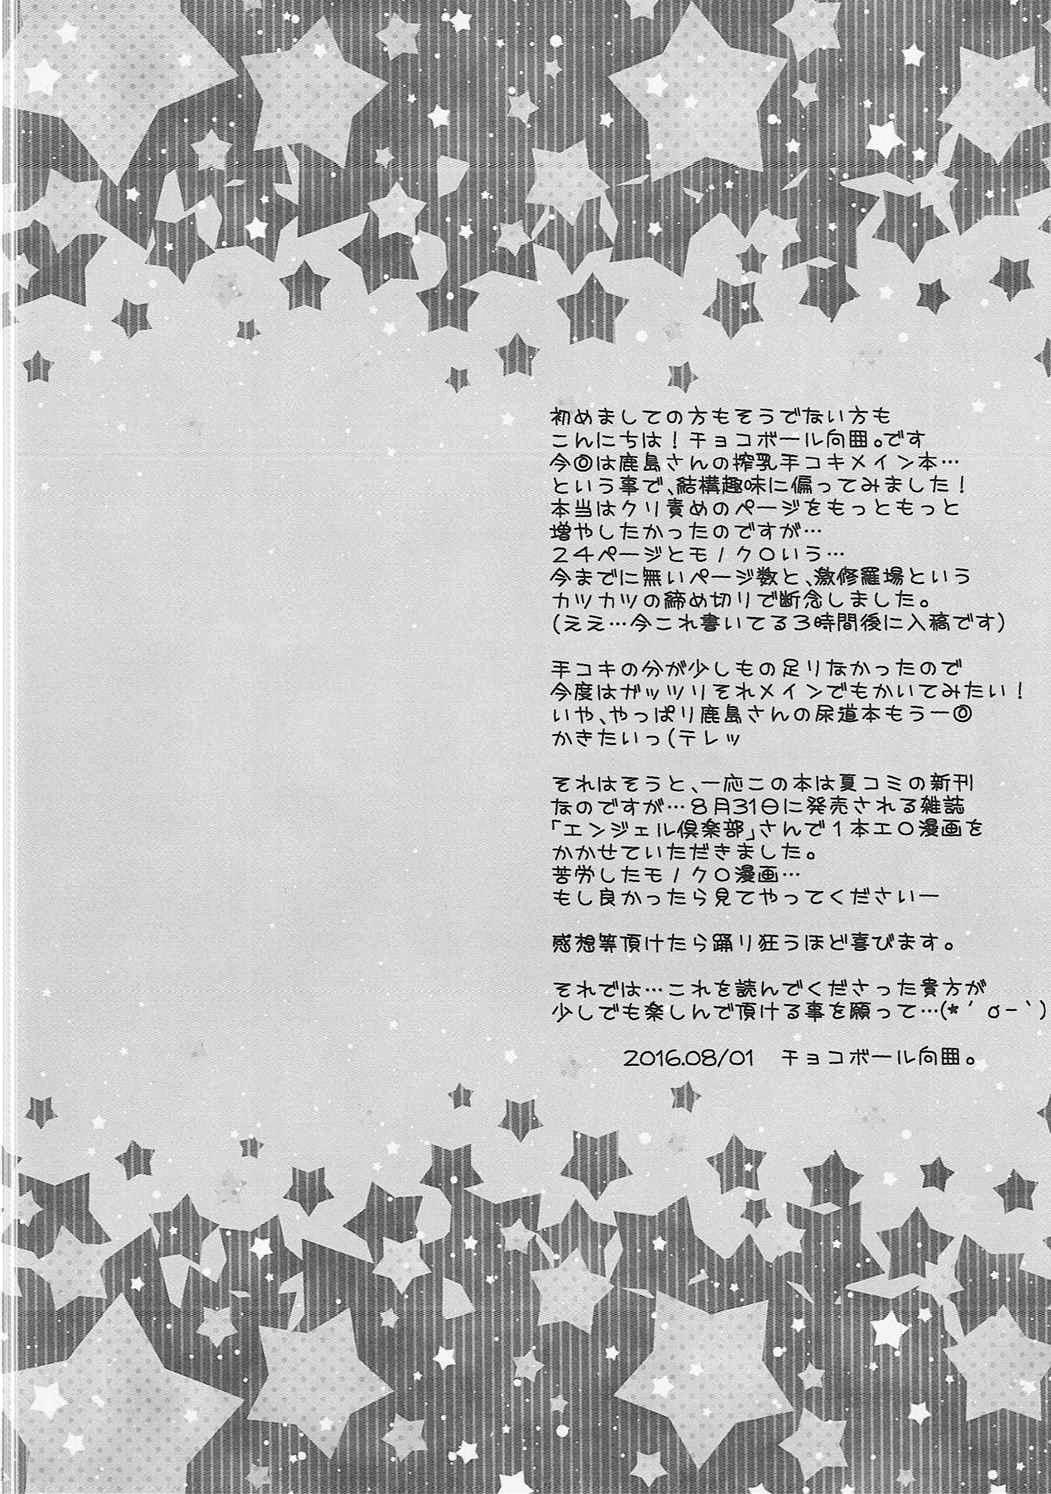 Tekoki Sakunyuu Kashima-san 2